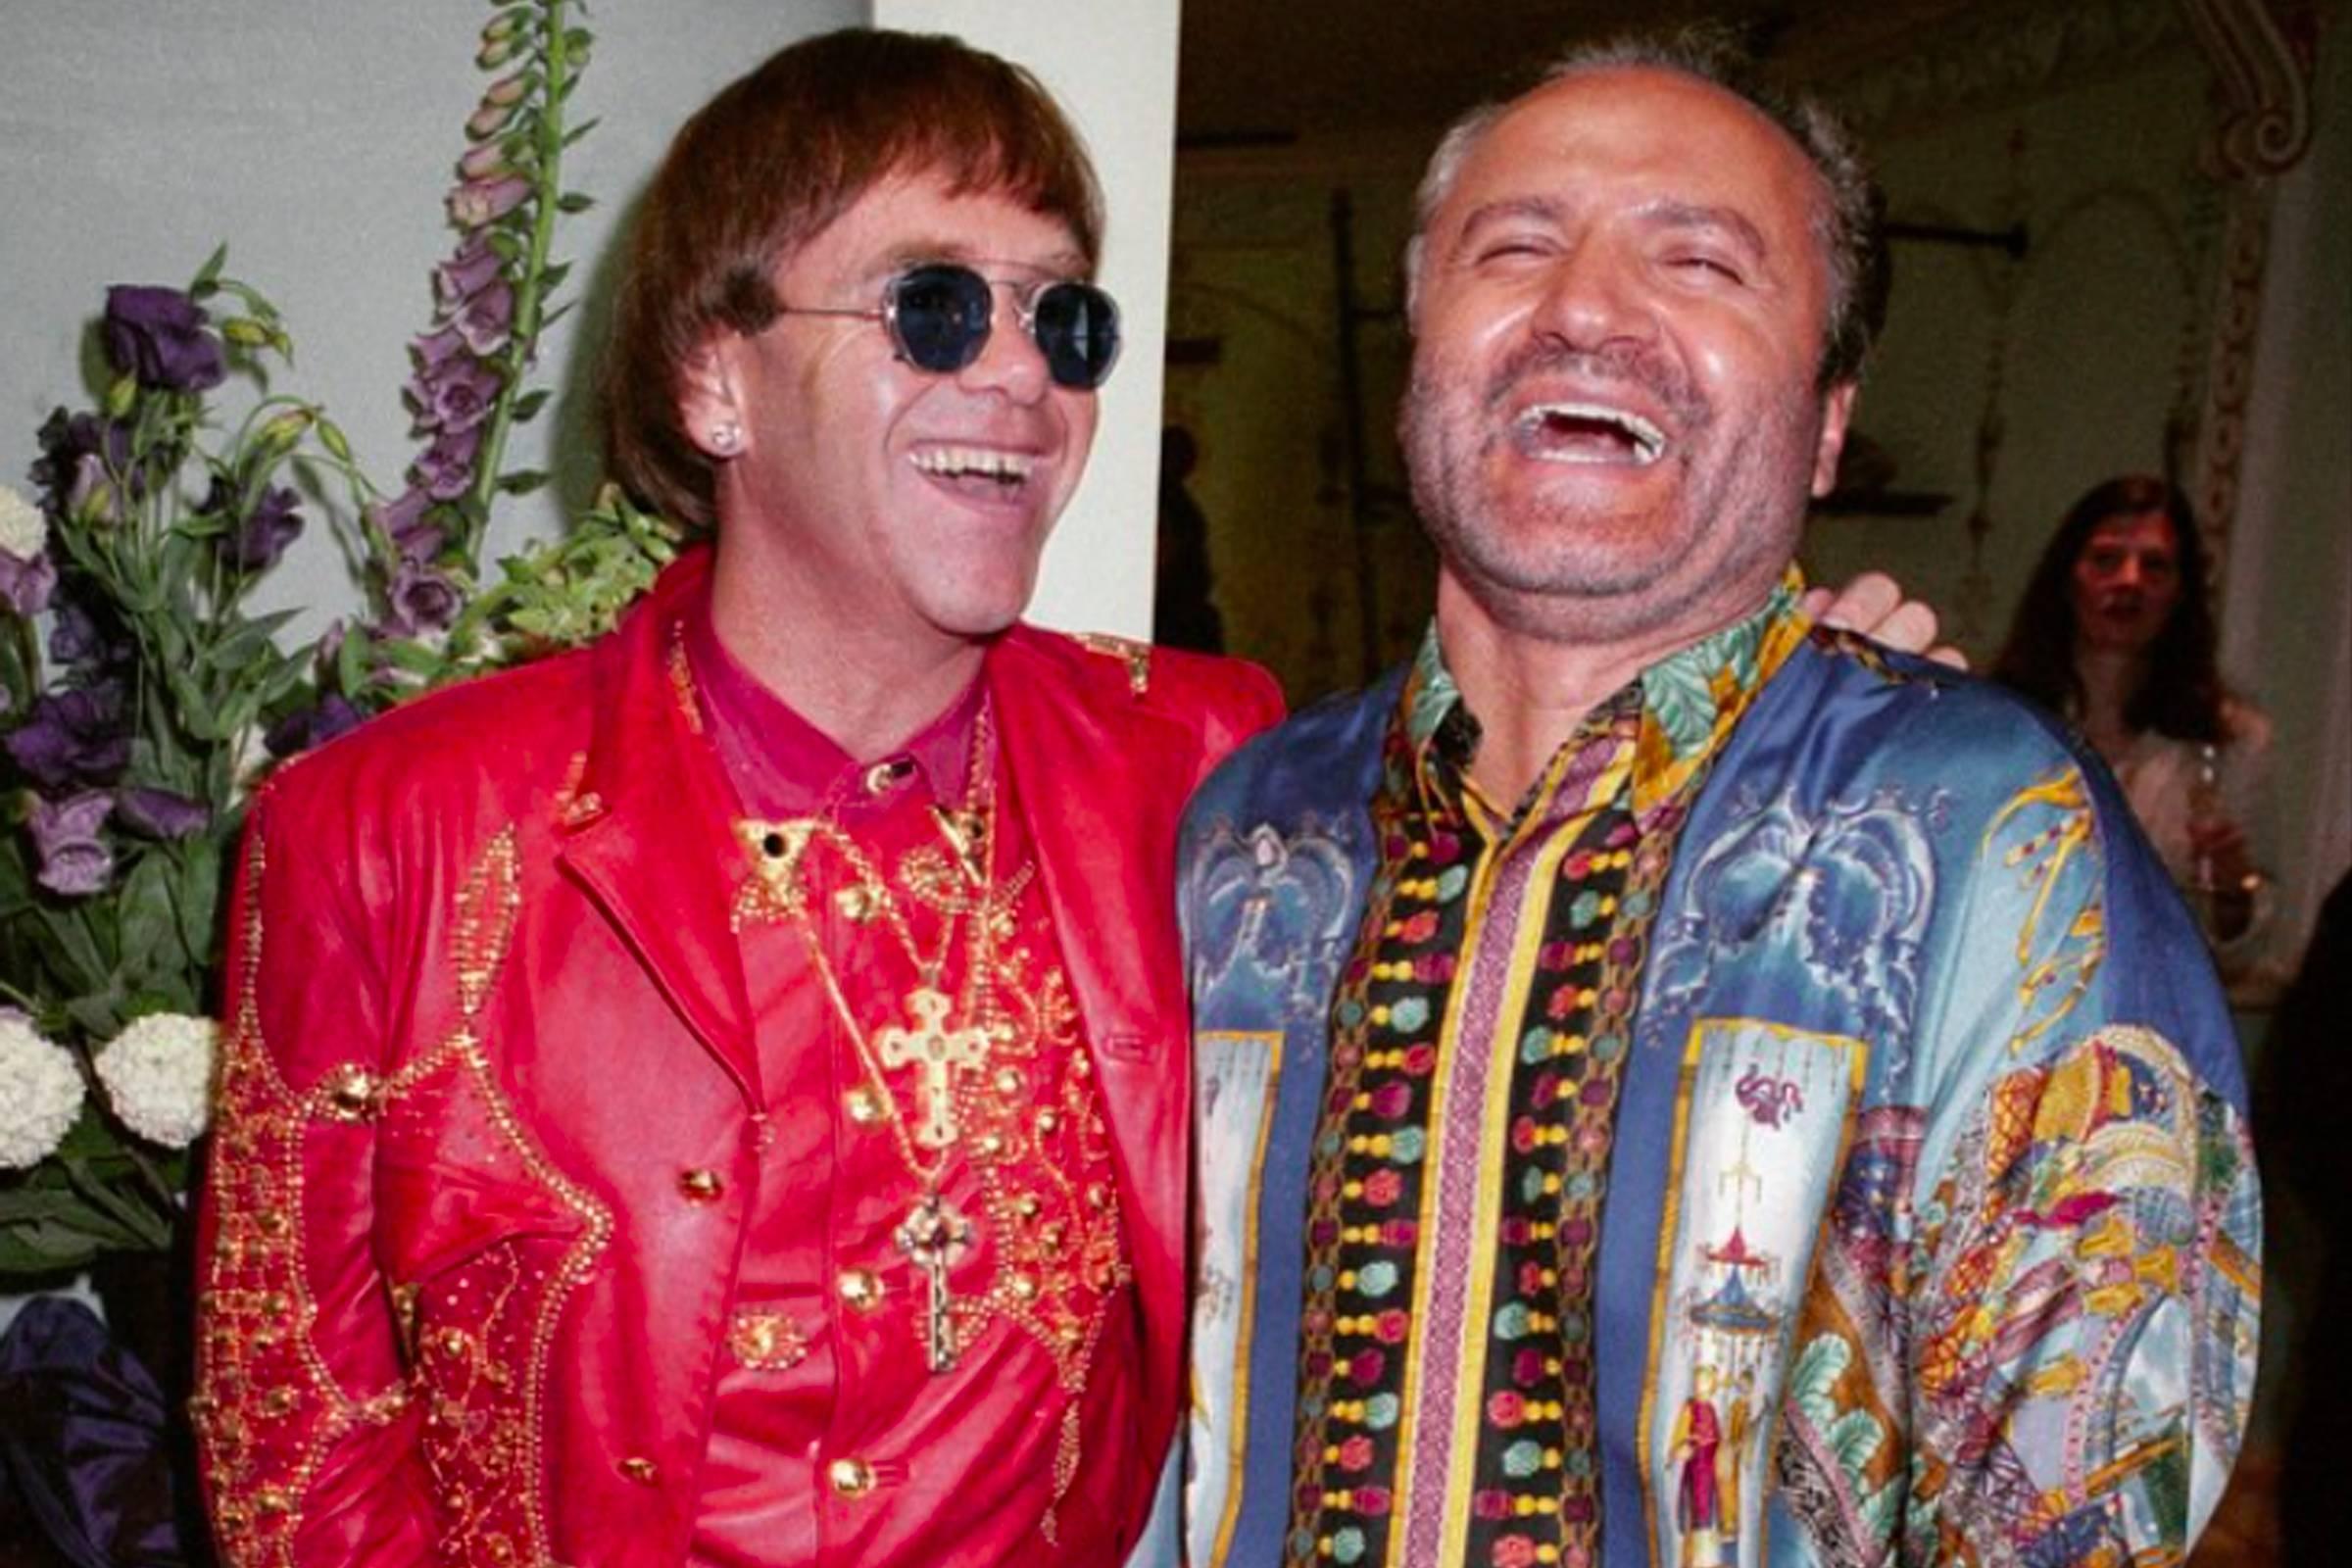 Elton John (left) with Gianni Versace, 1992